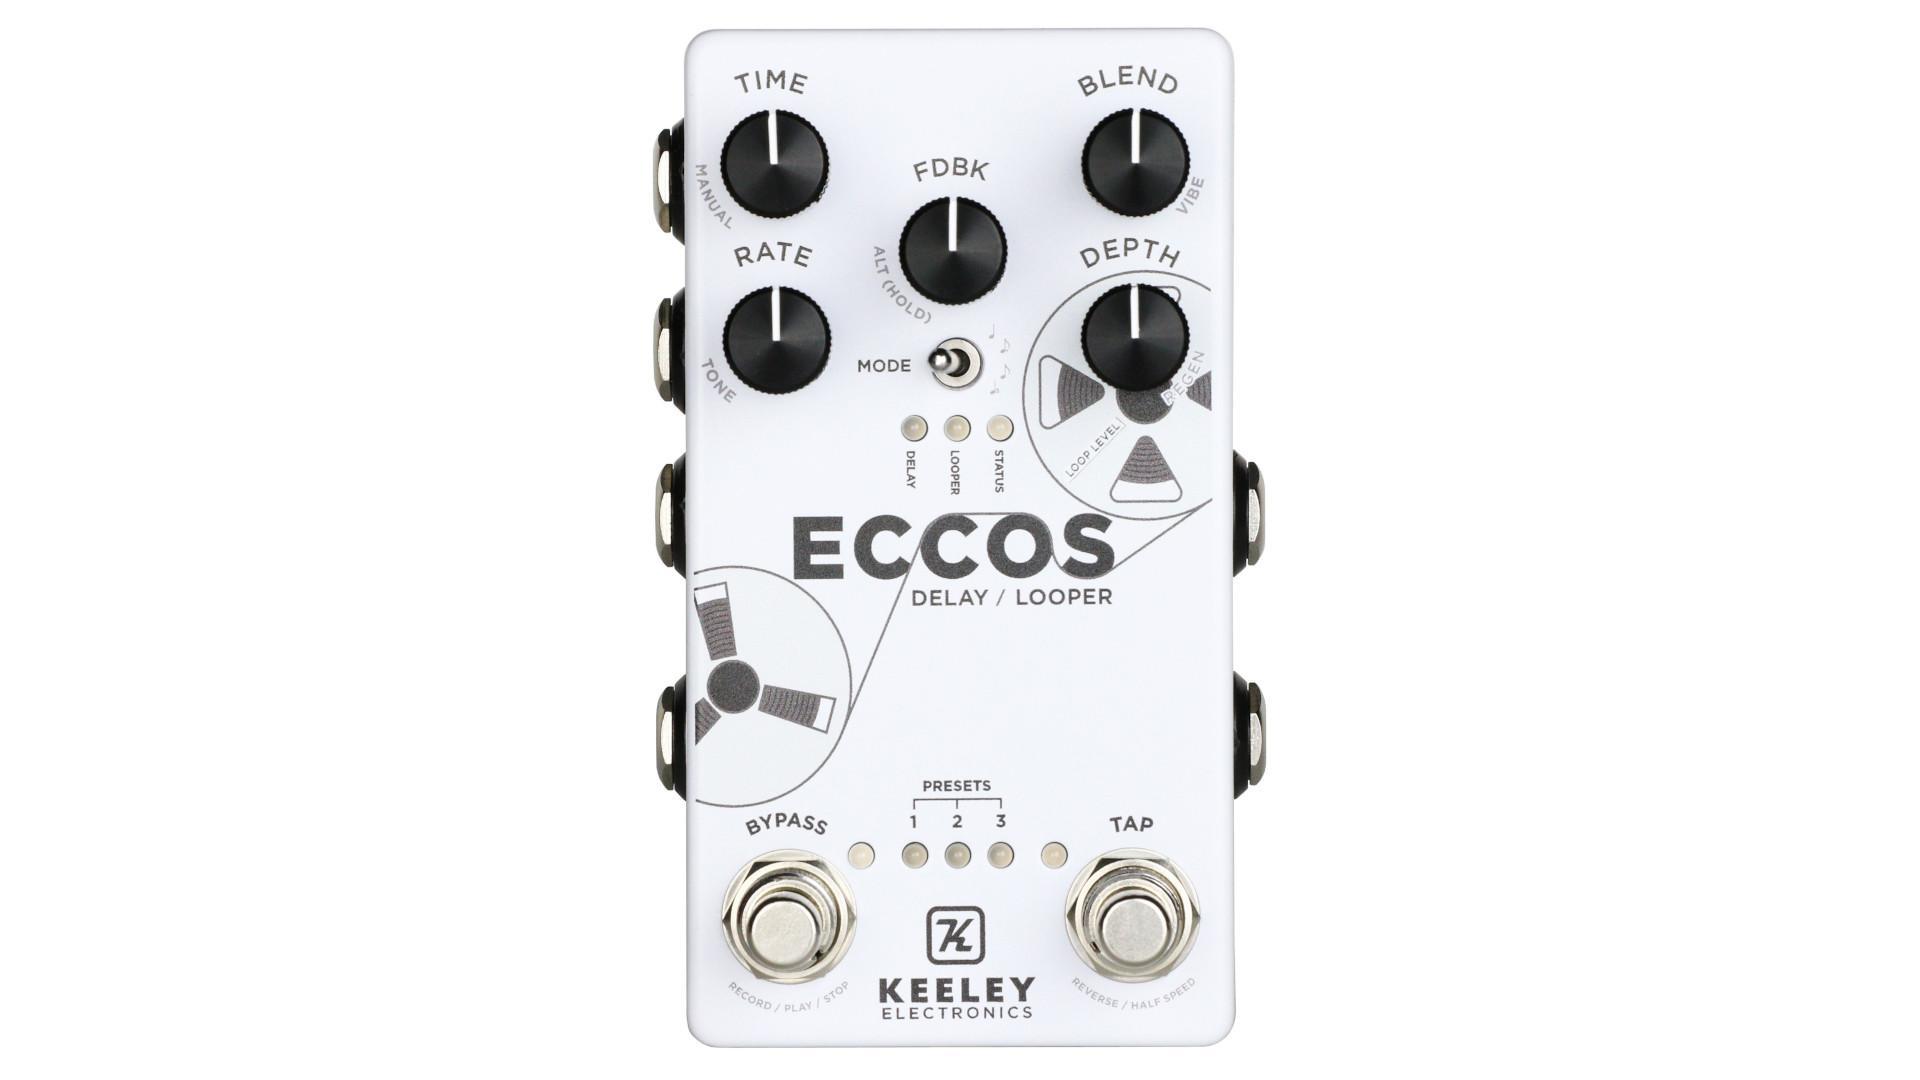 Keeley Electronics ECCOS - Delay / Looper